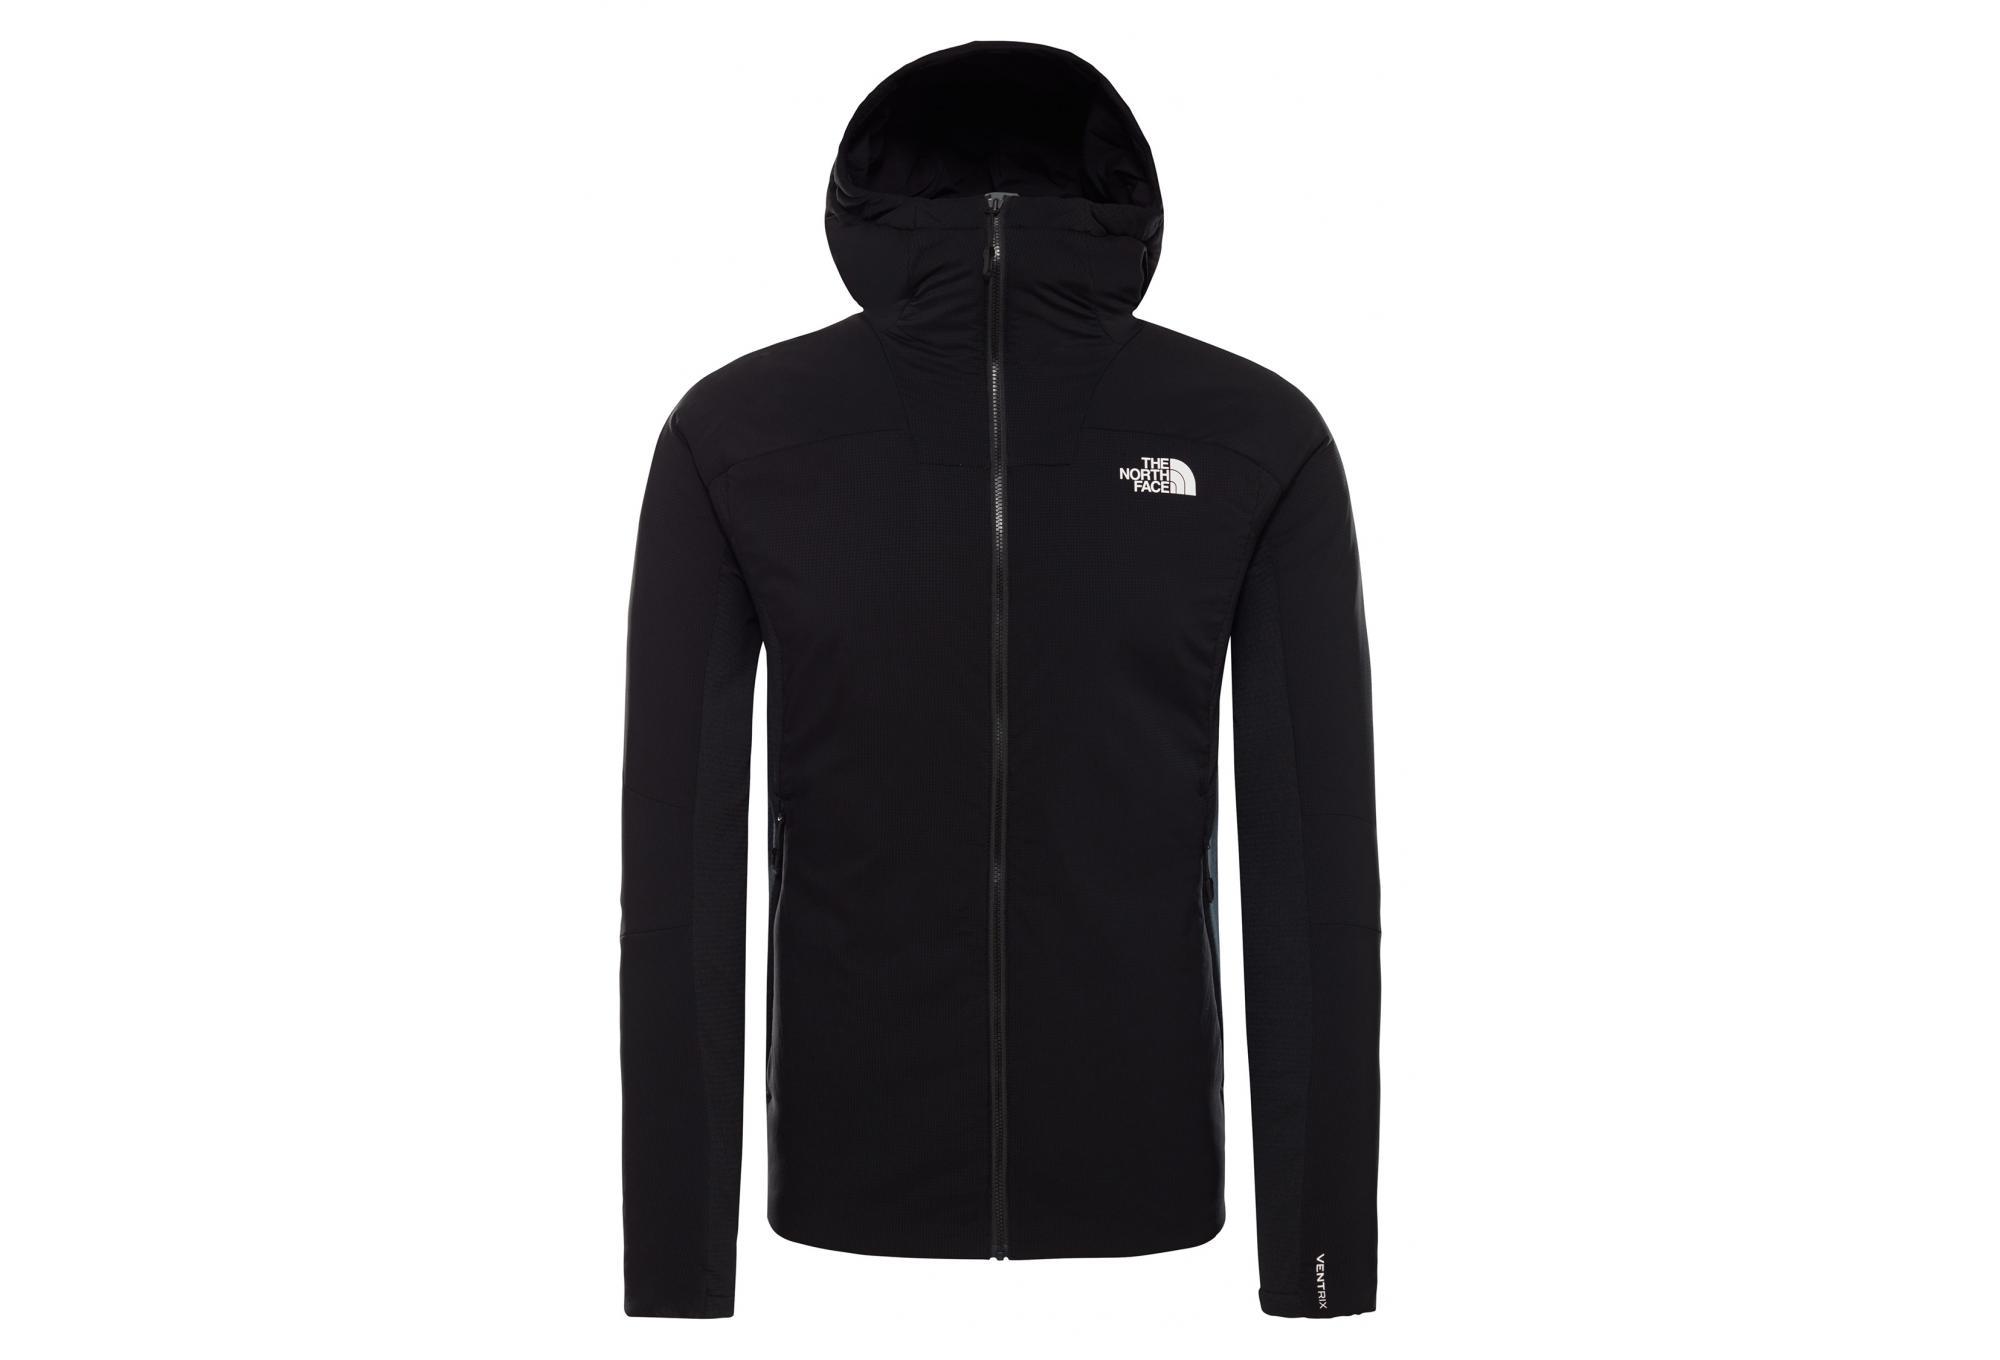 bff23ab0e The North Face Thermal Jacket Ventrix Hybrid Black Men